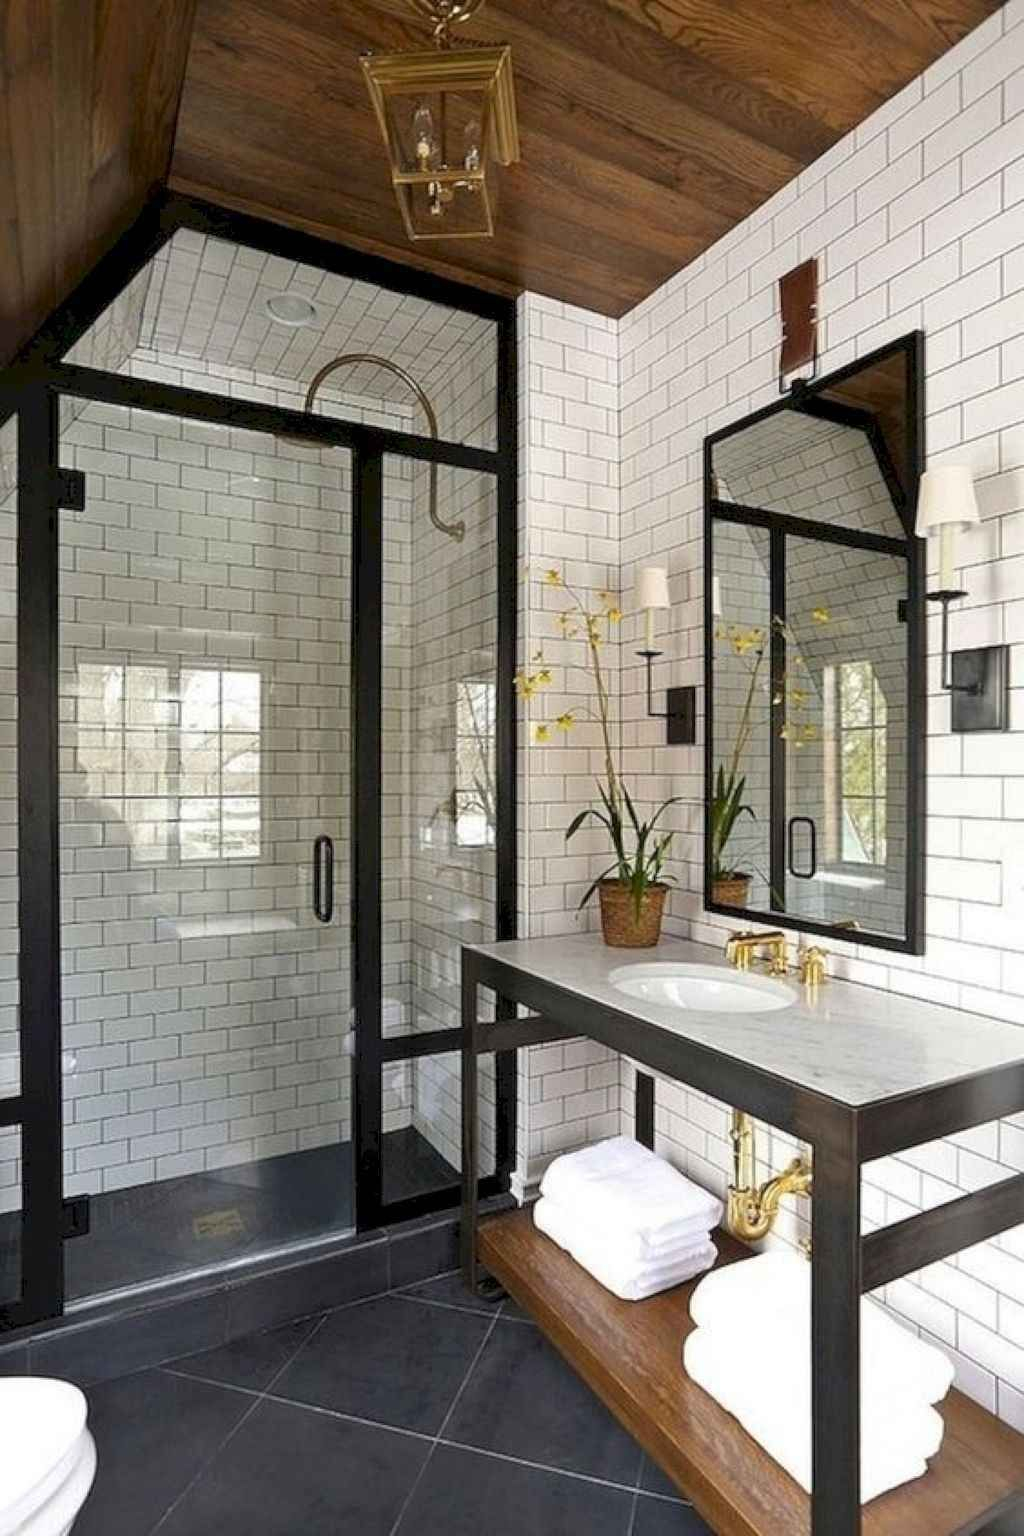 Astonishing Farmhouse Shower Tile Decor Ideas To Try 45